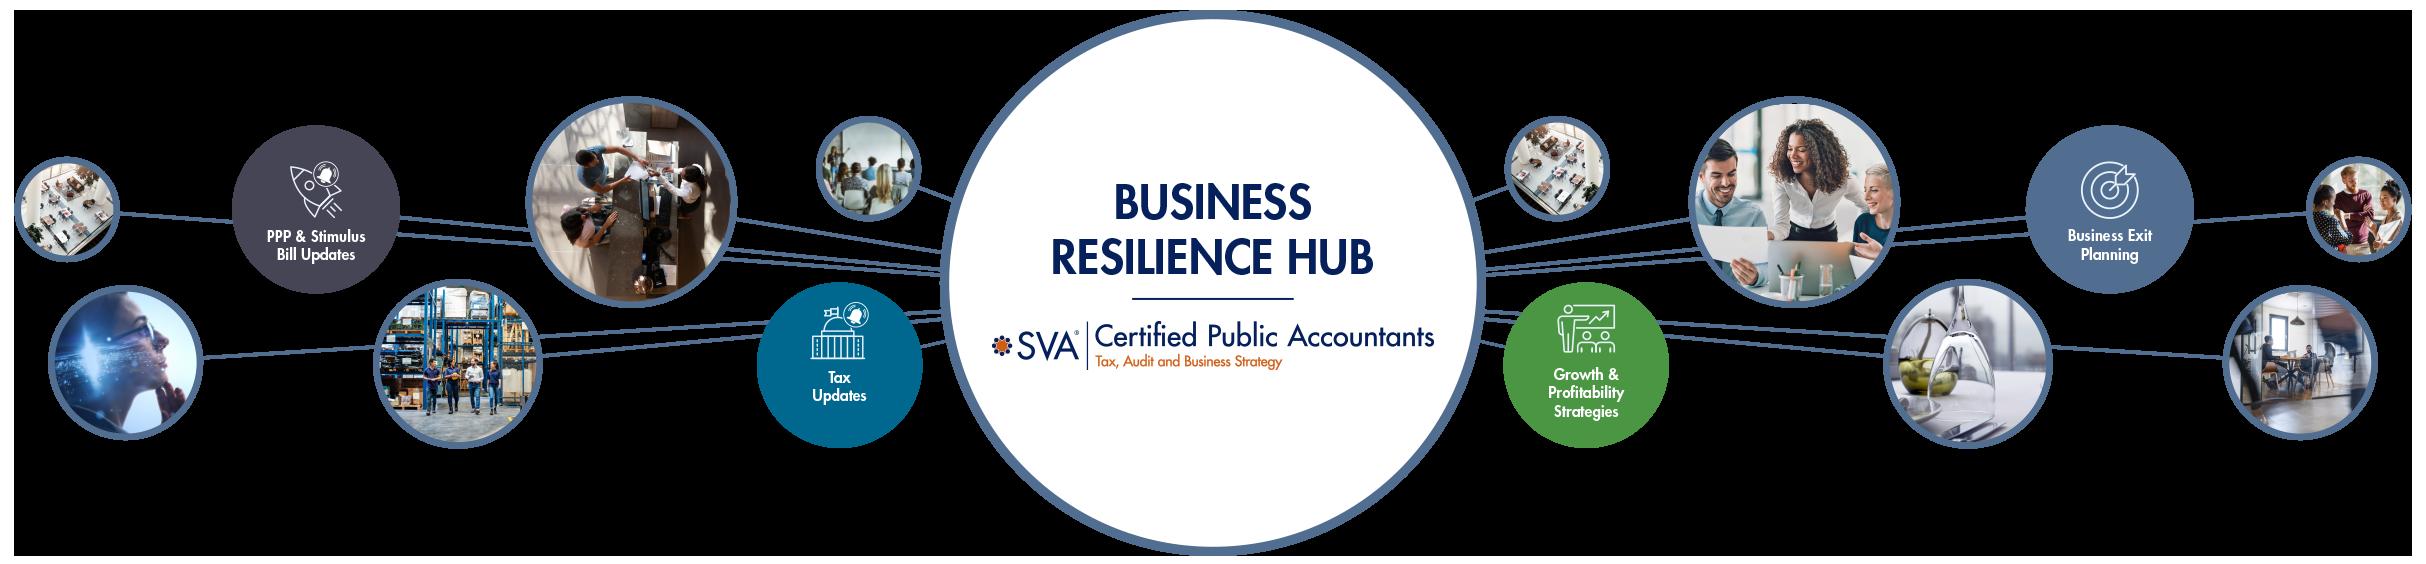 covid-19-business-resilience-hub